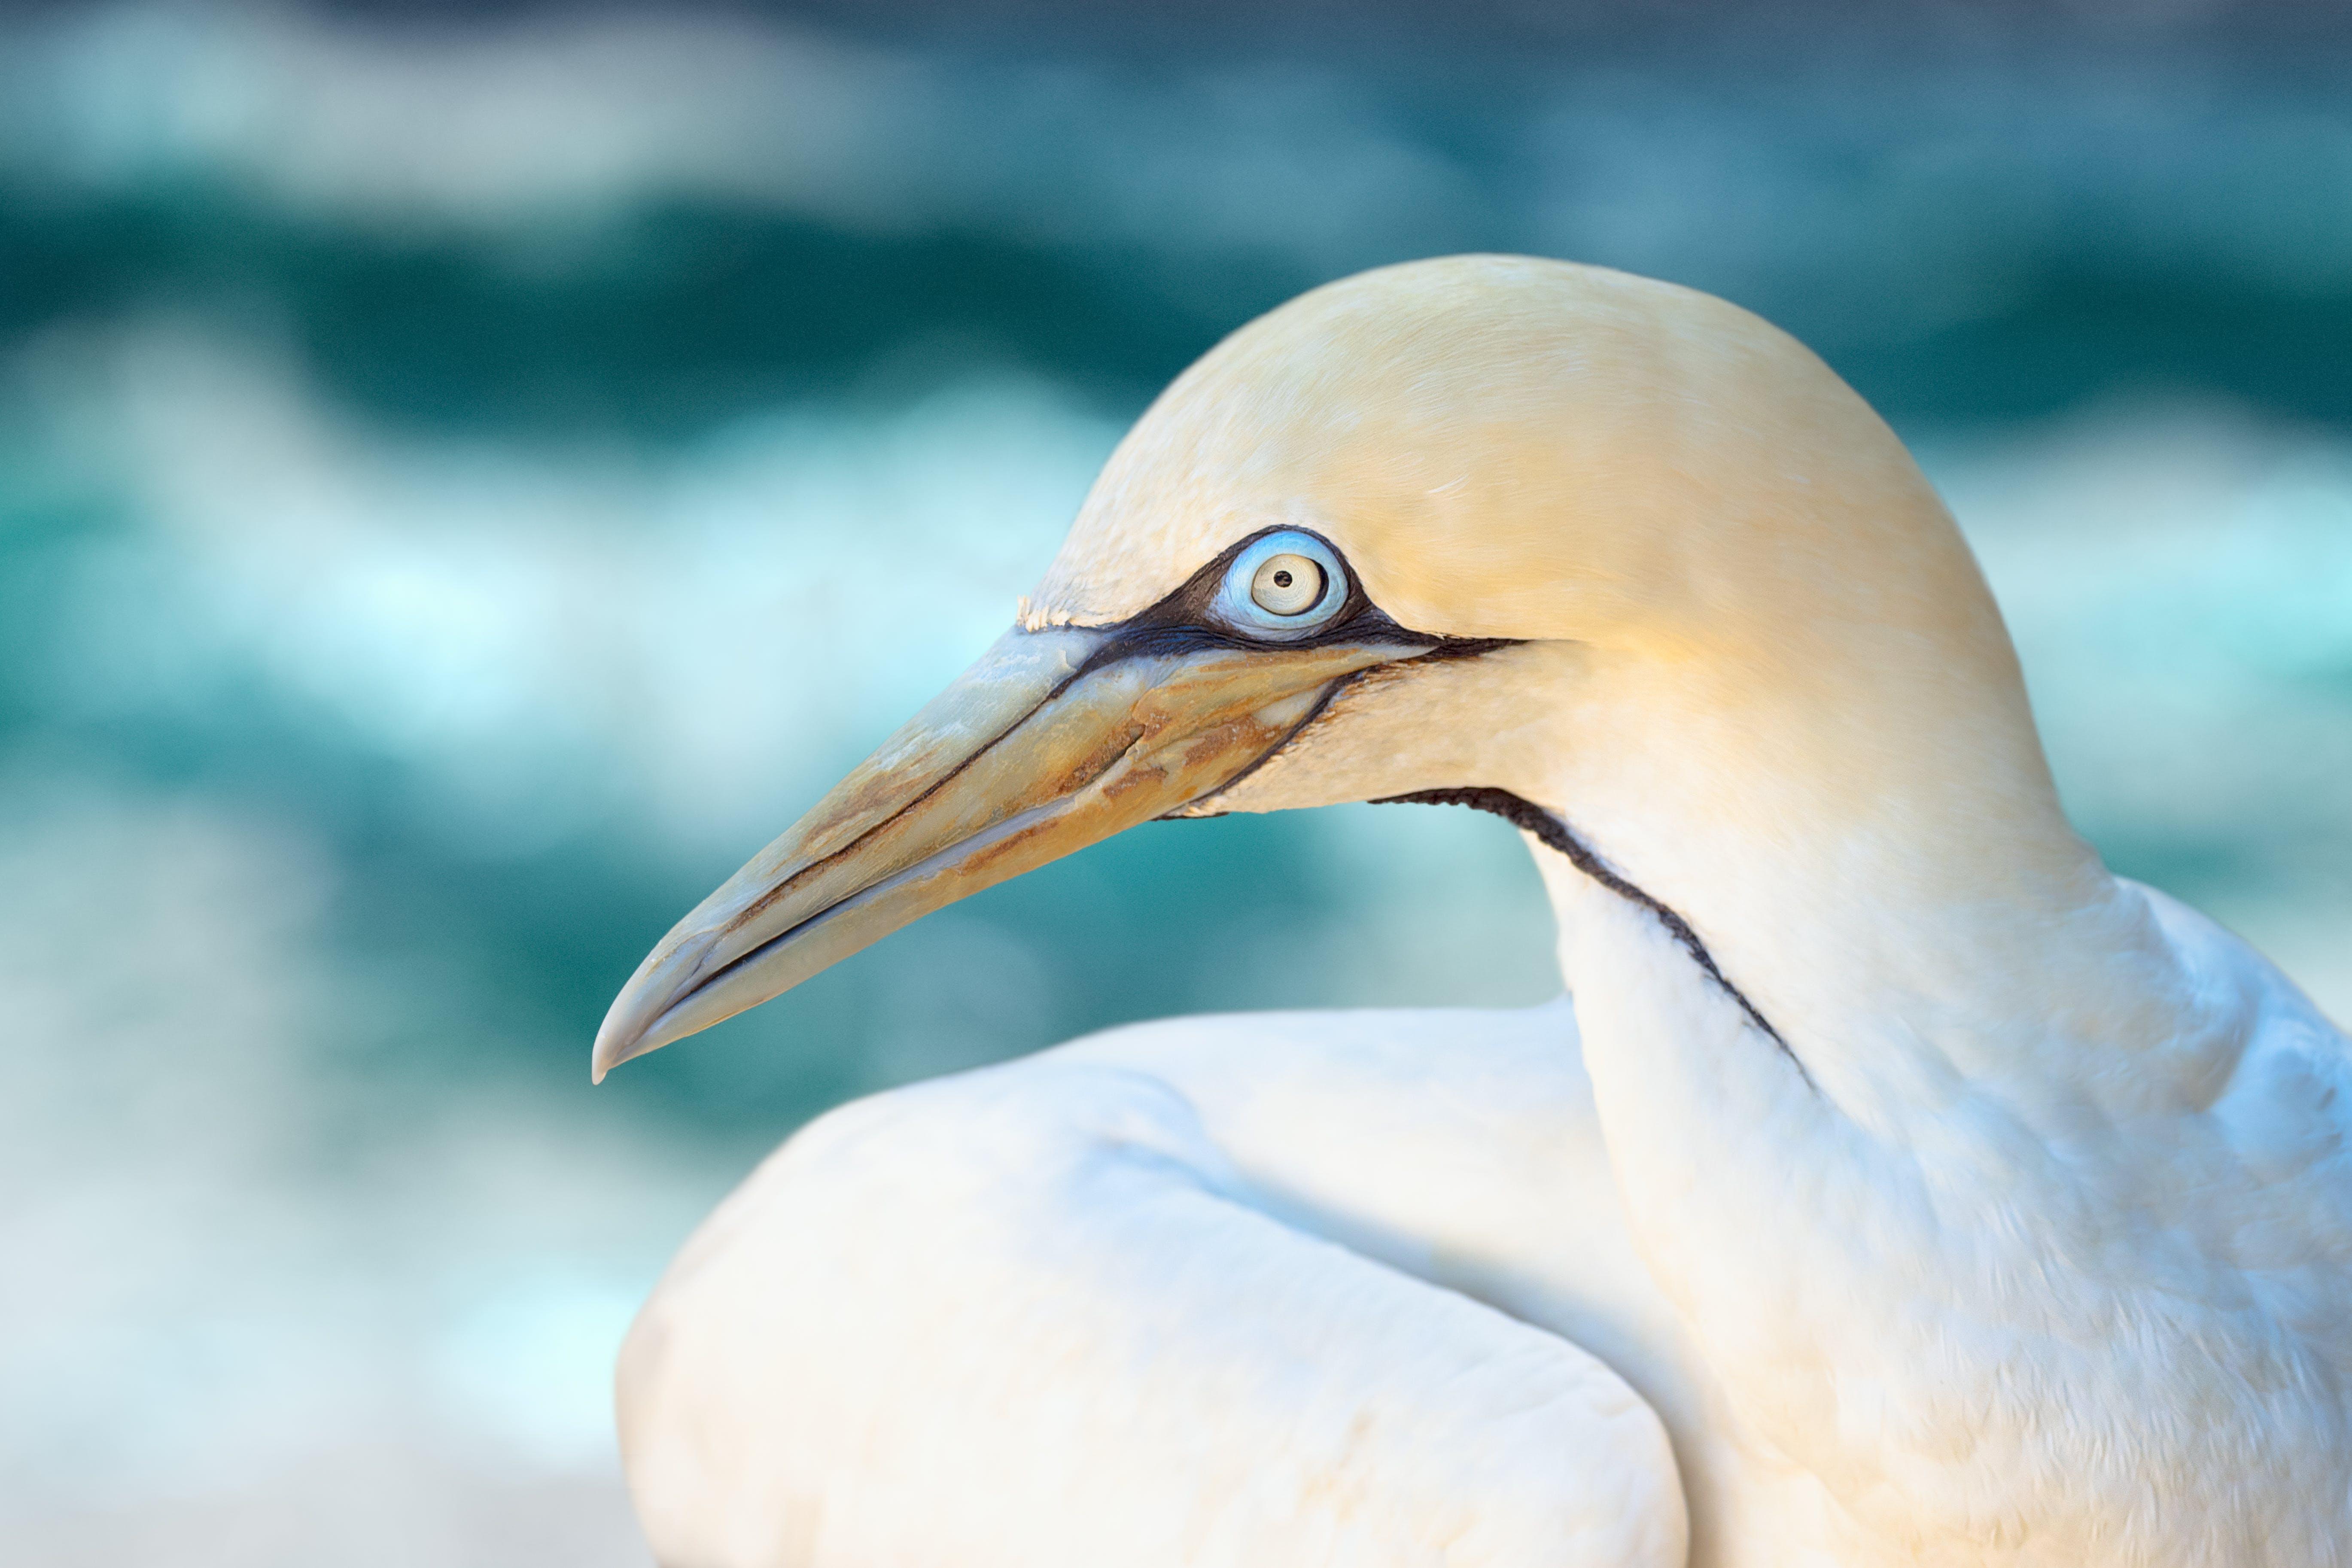 Close-Up Photo of White Bird